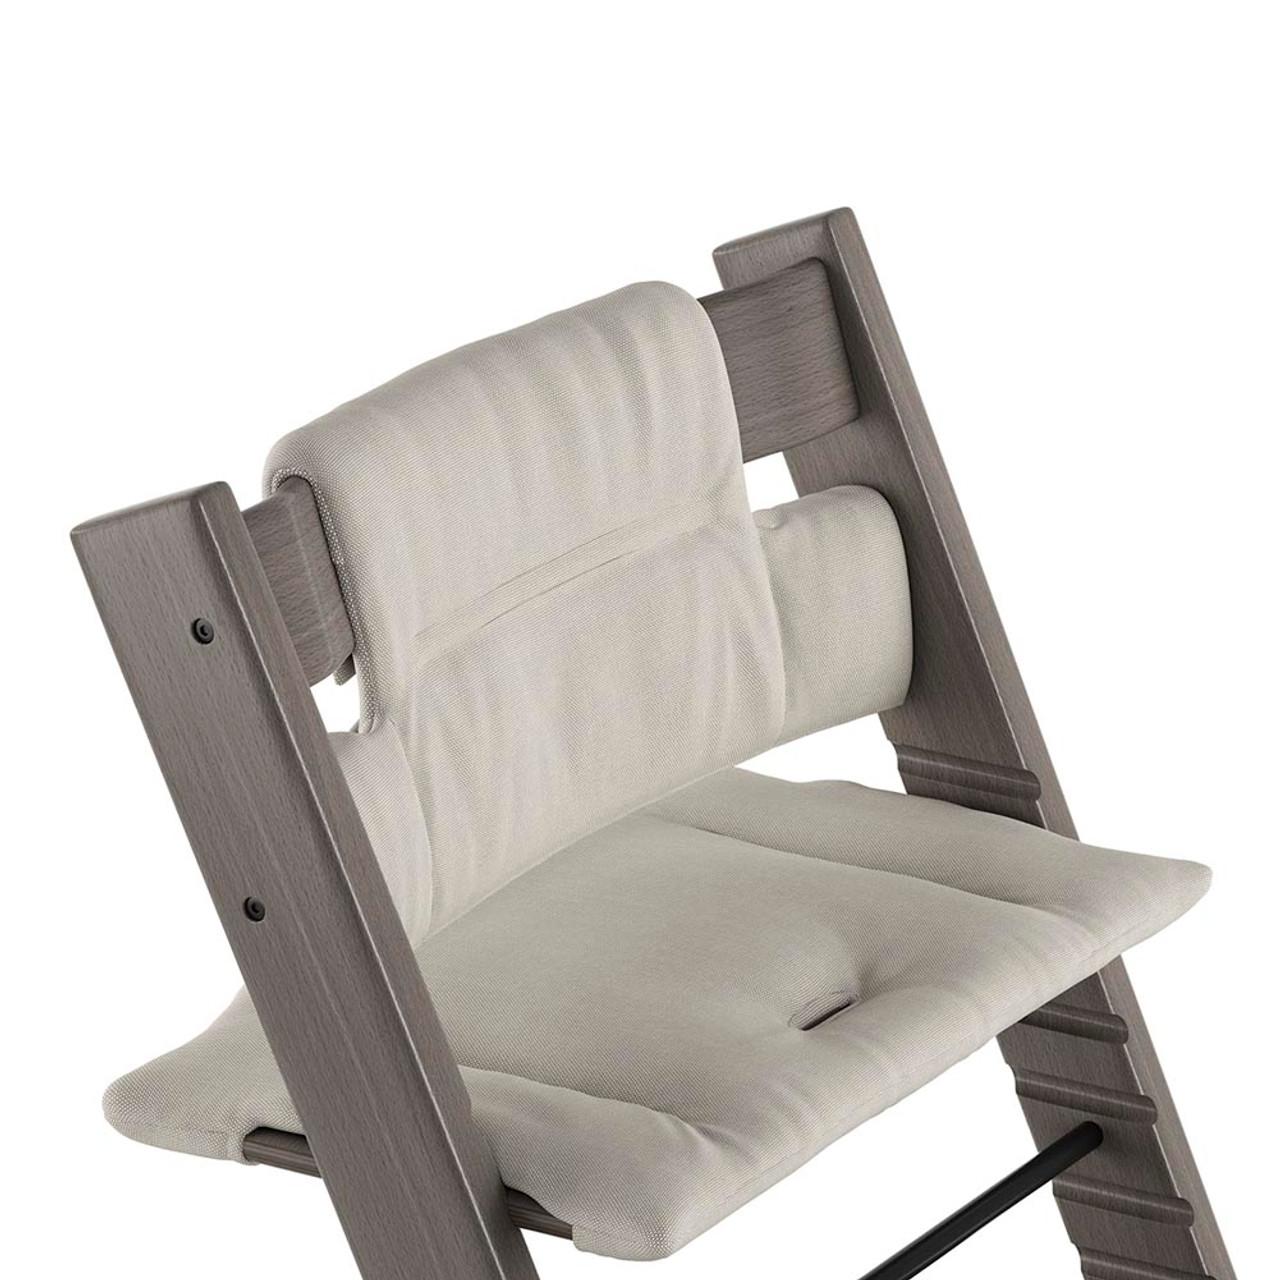 b204edeeb81 Stokke Tripp Trapp Organic Cotton Cushion - Timeless Grey - Dear ...